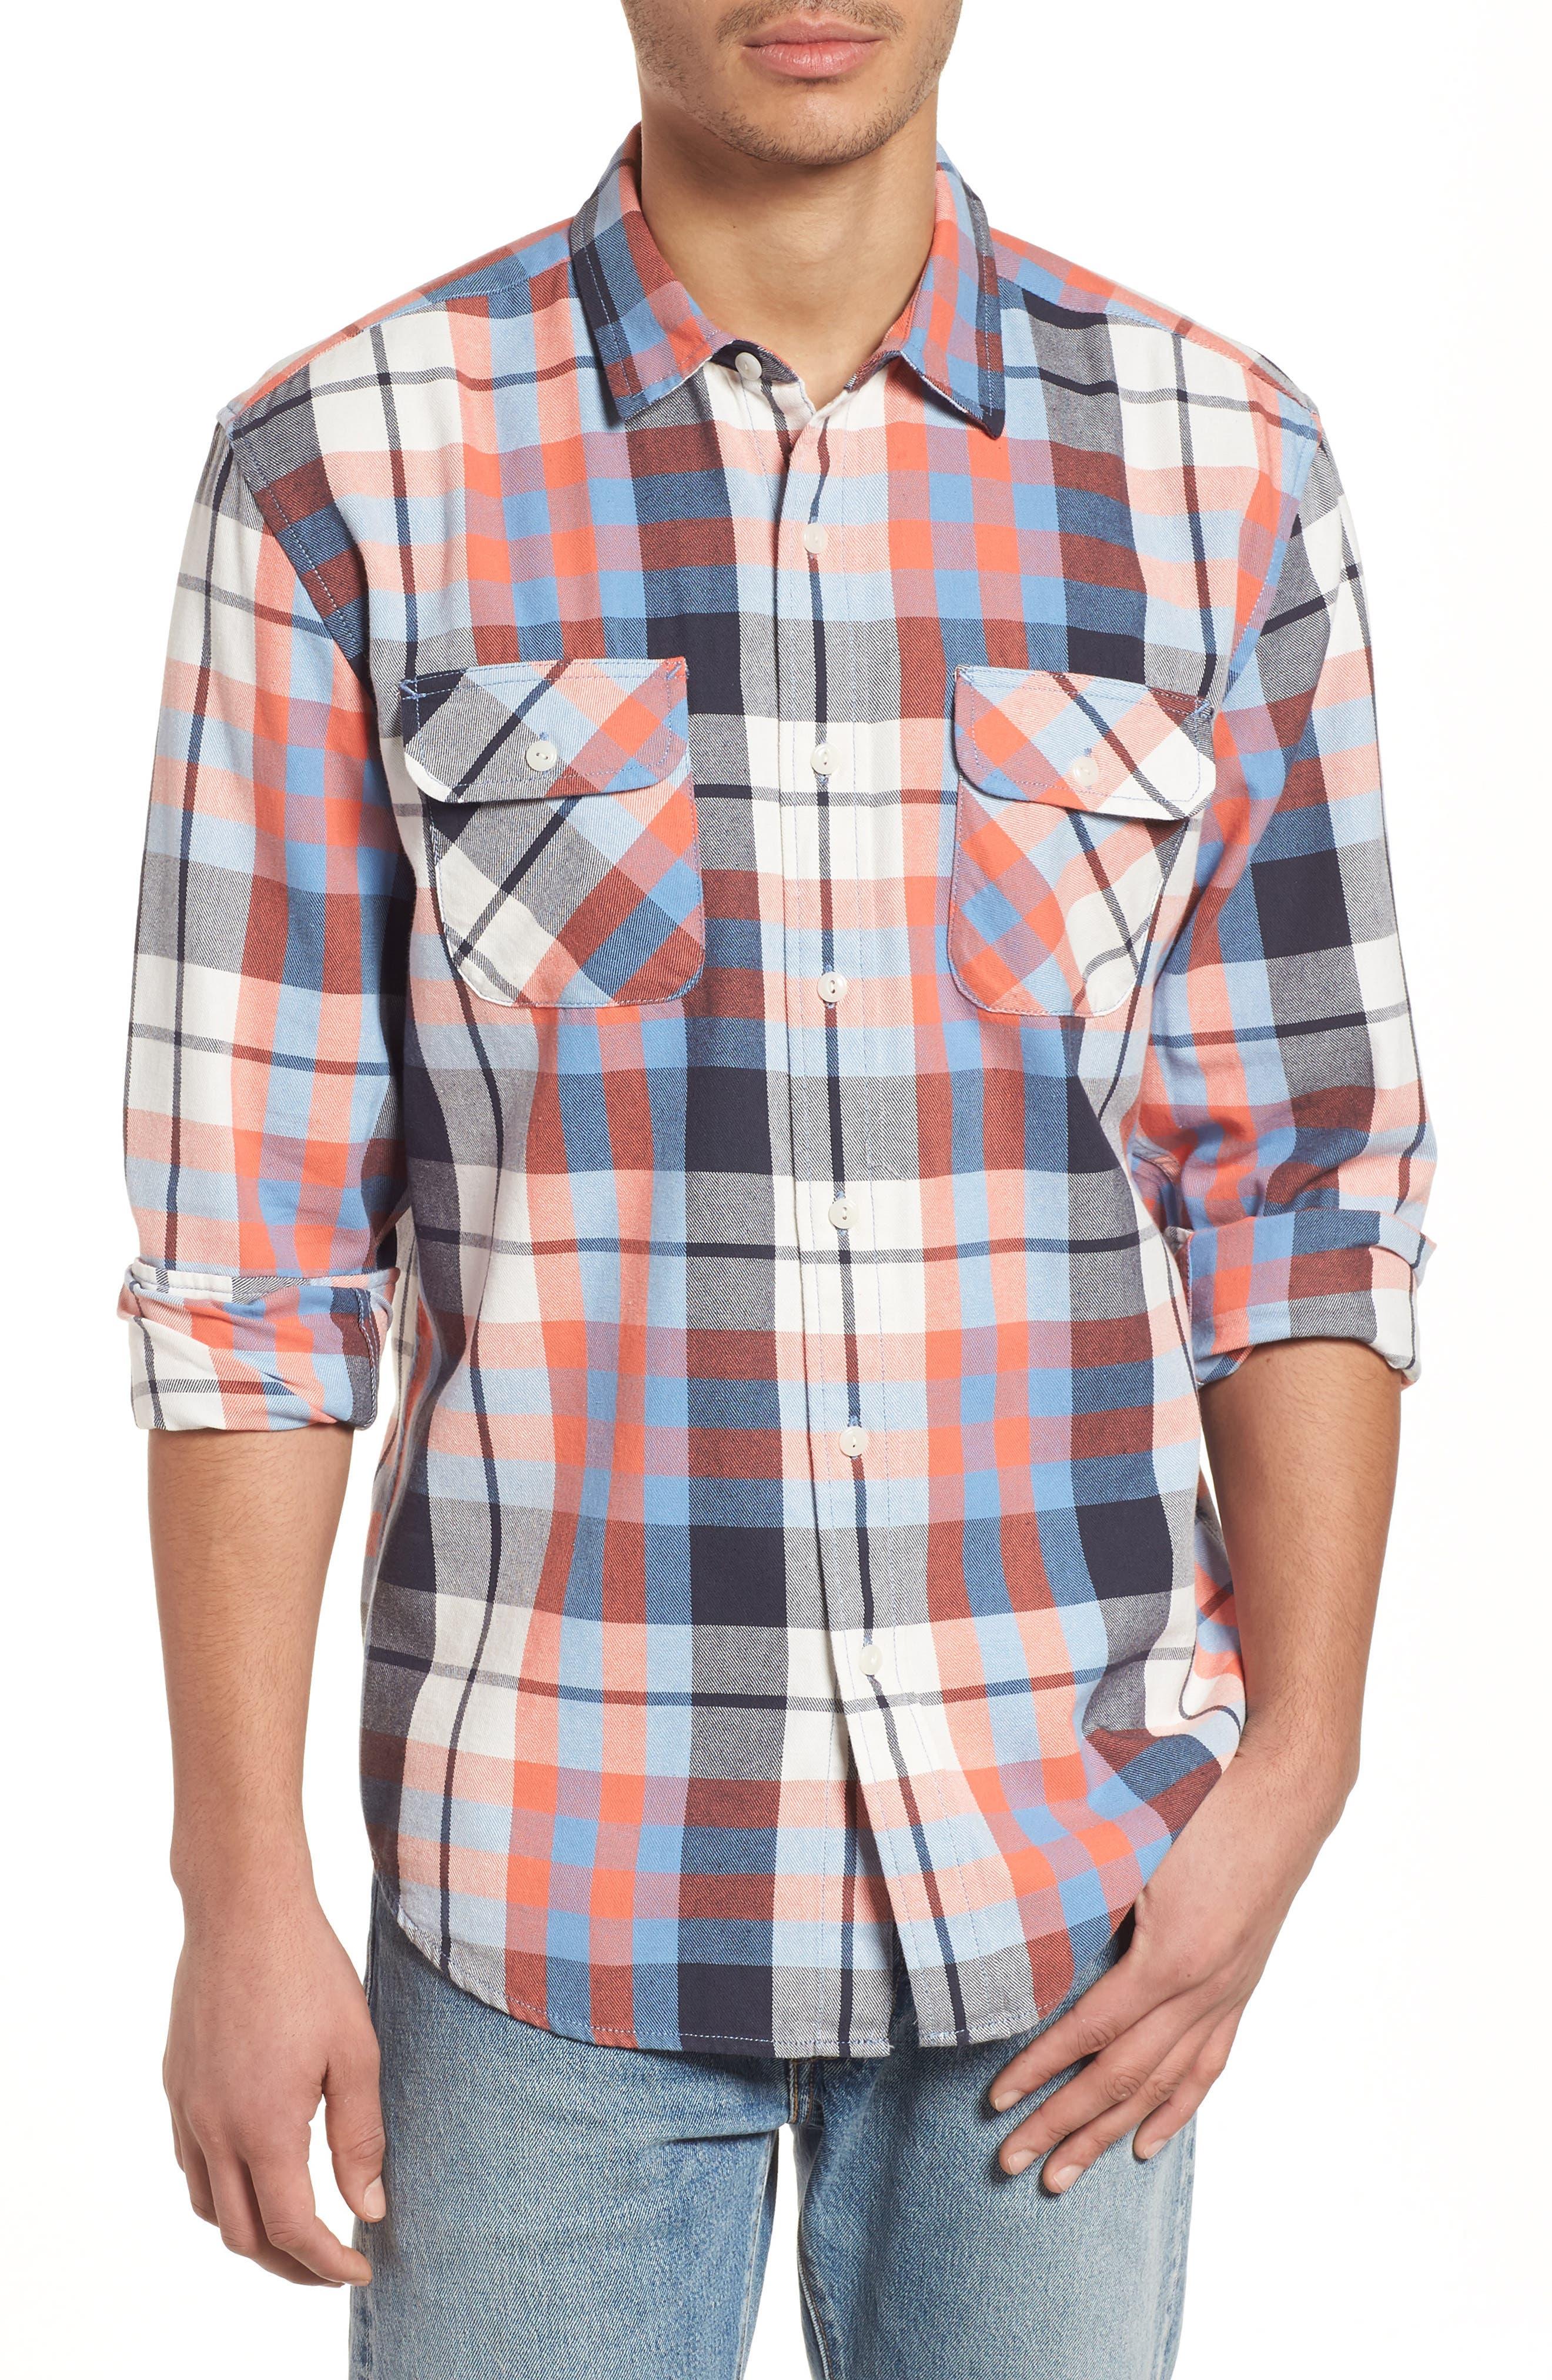 Beach Shack Twill Shirt,                         Main,                         color, 424